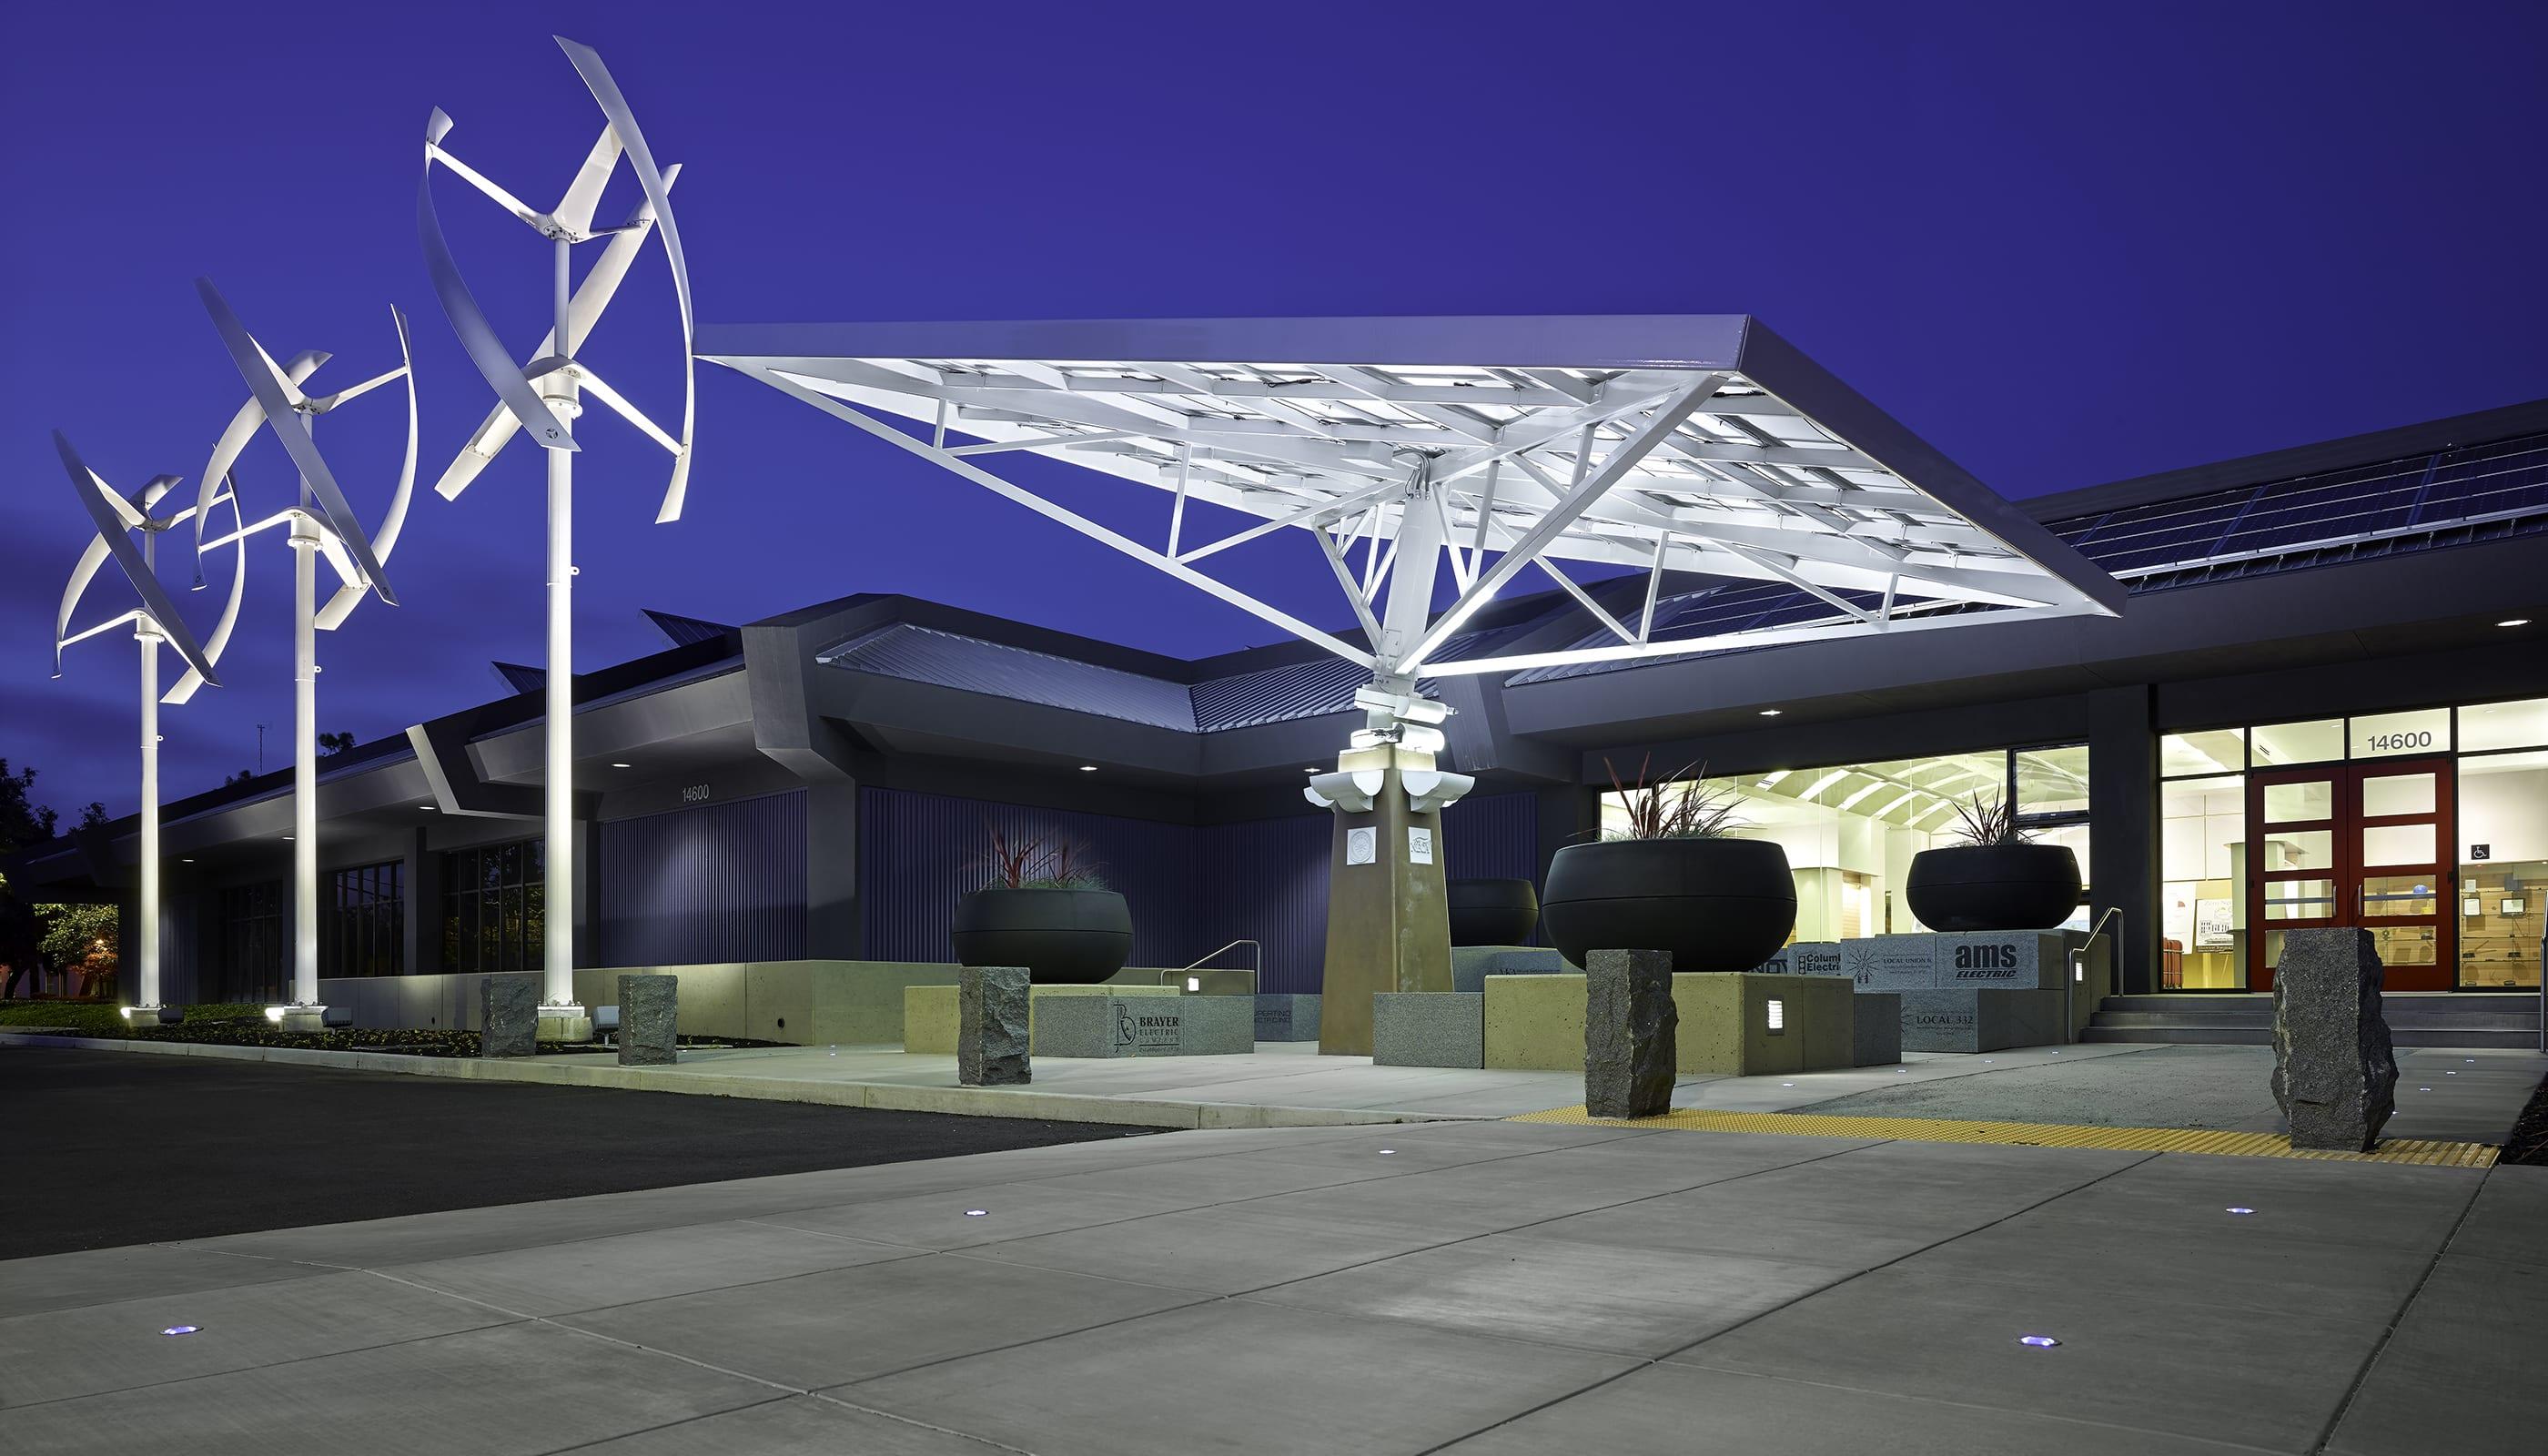 Zero Net Energy Center - Commercial Architecture